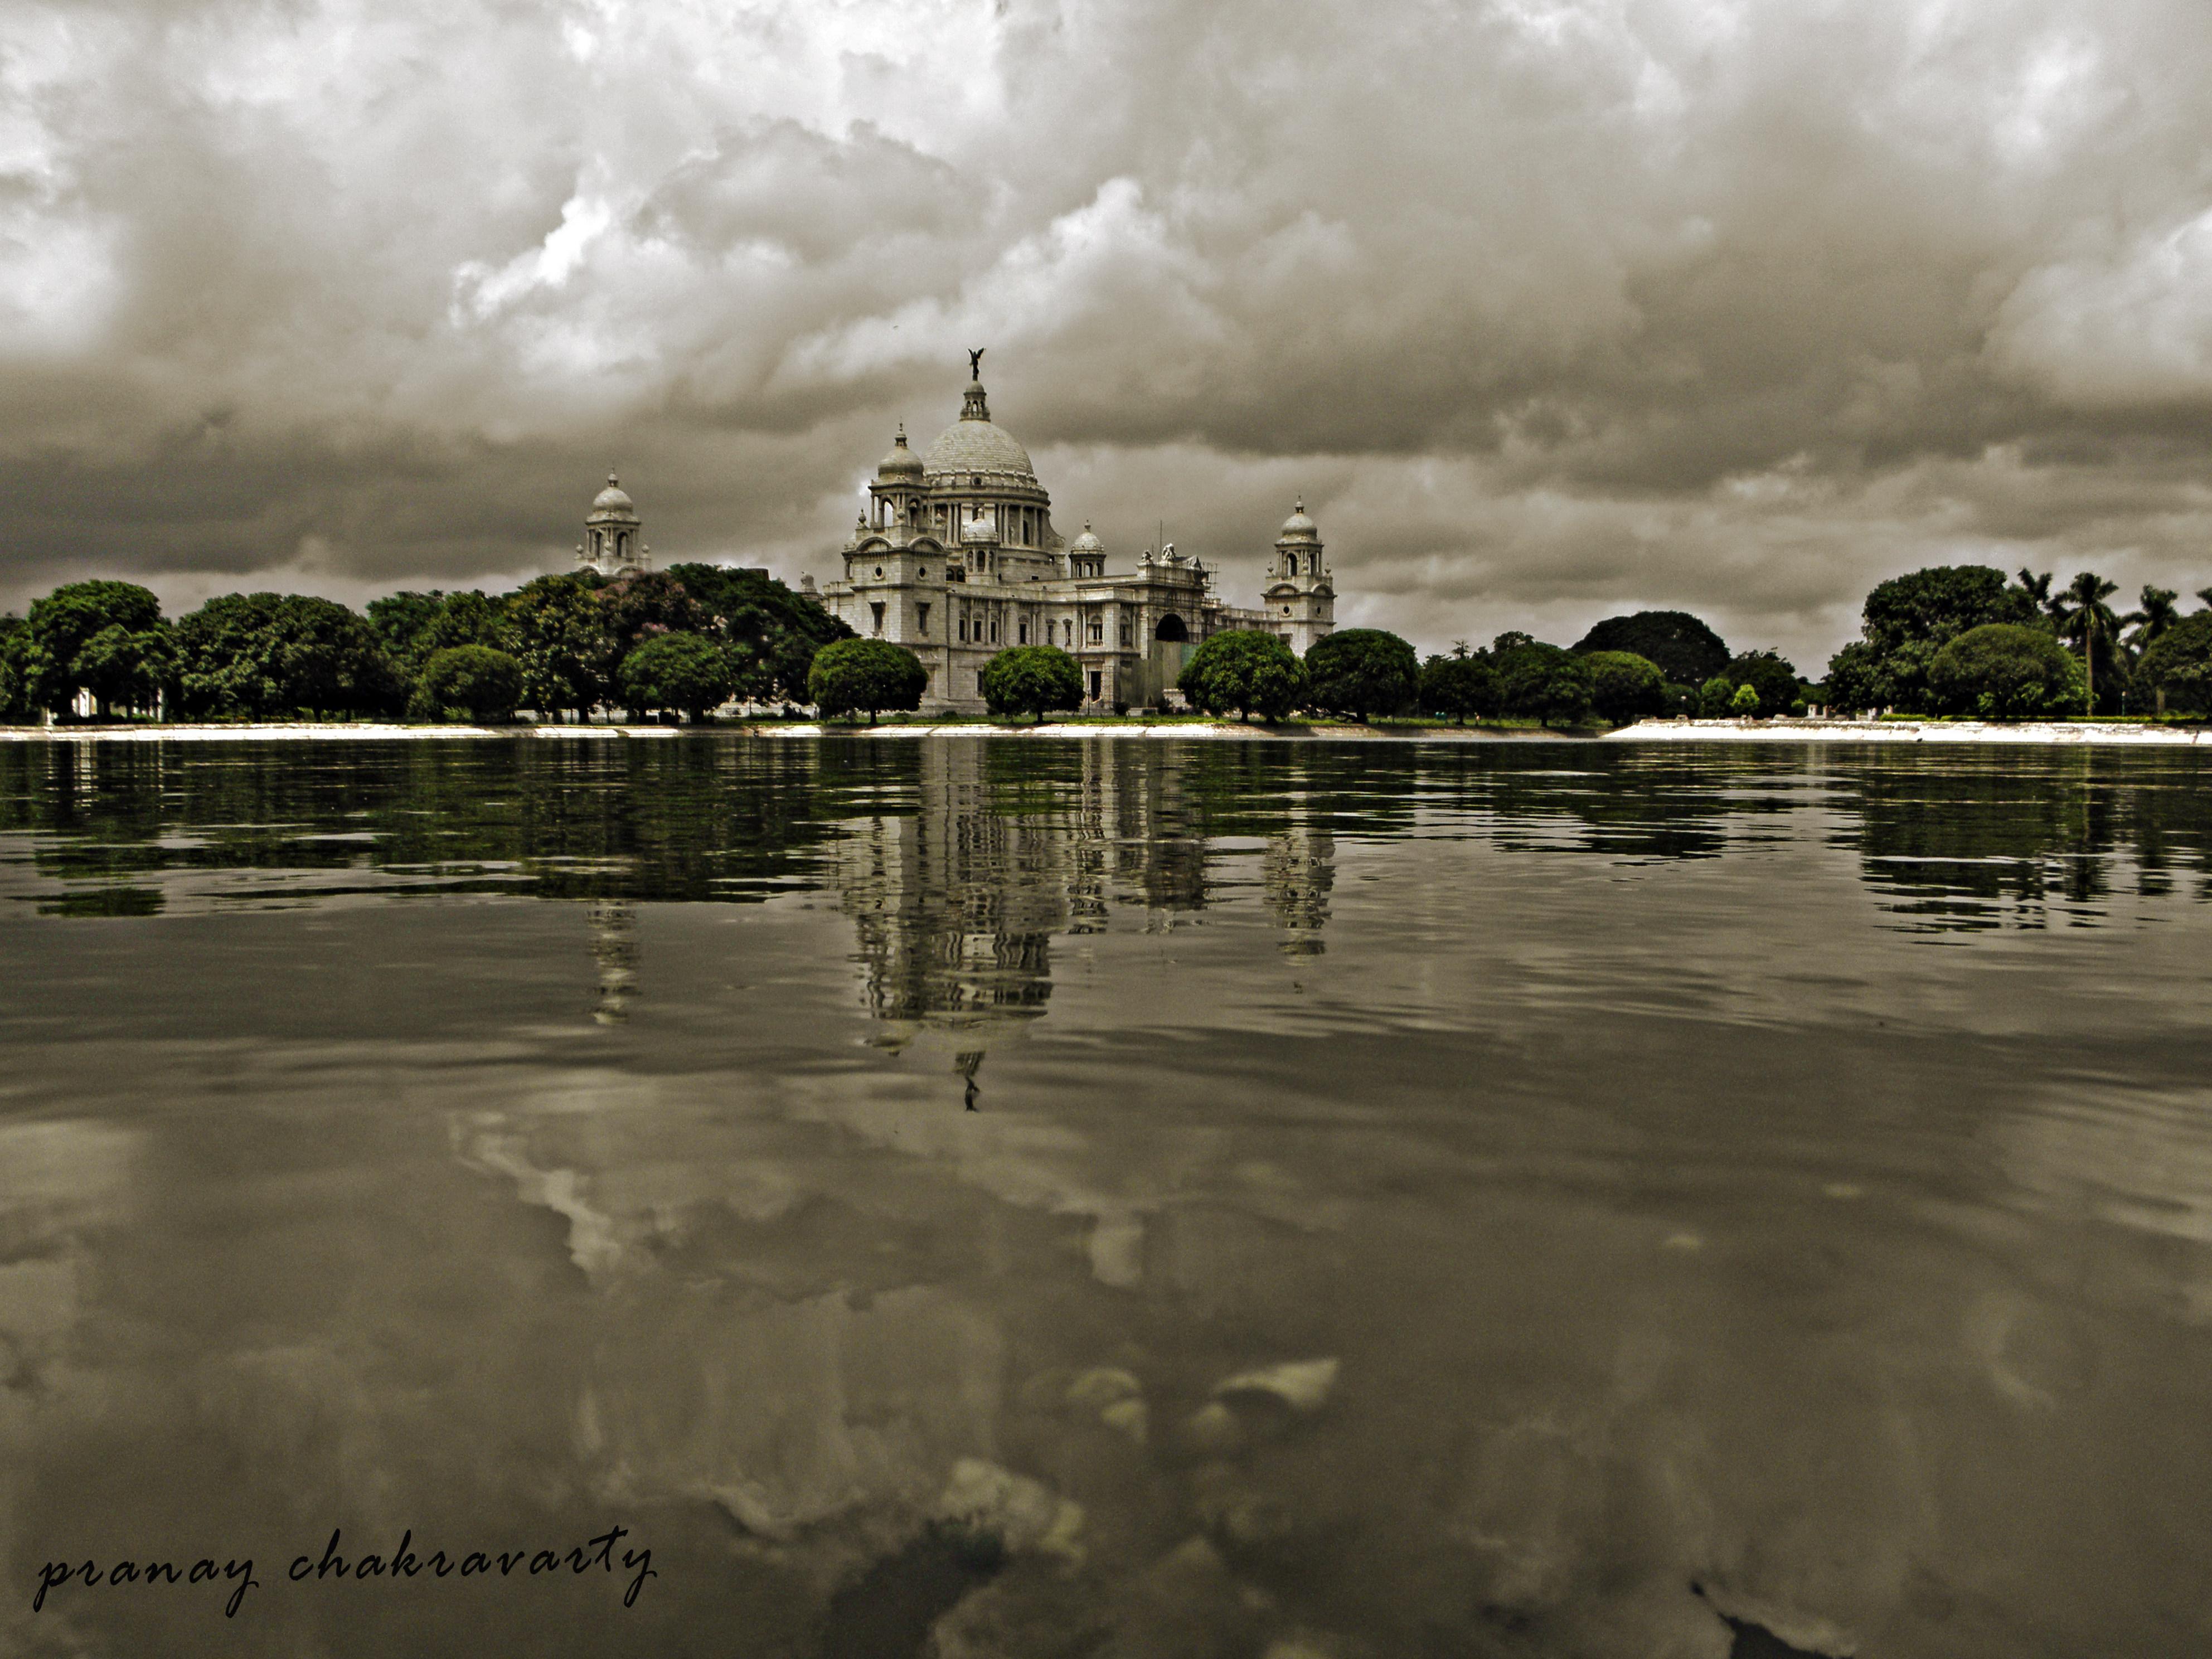 Sfondi paesaggio citt asia creatura acqua cielo for Bengala asia